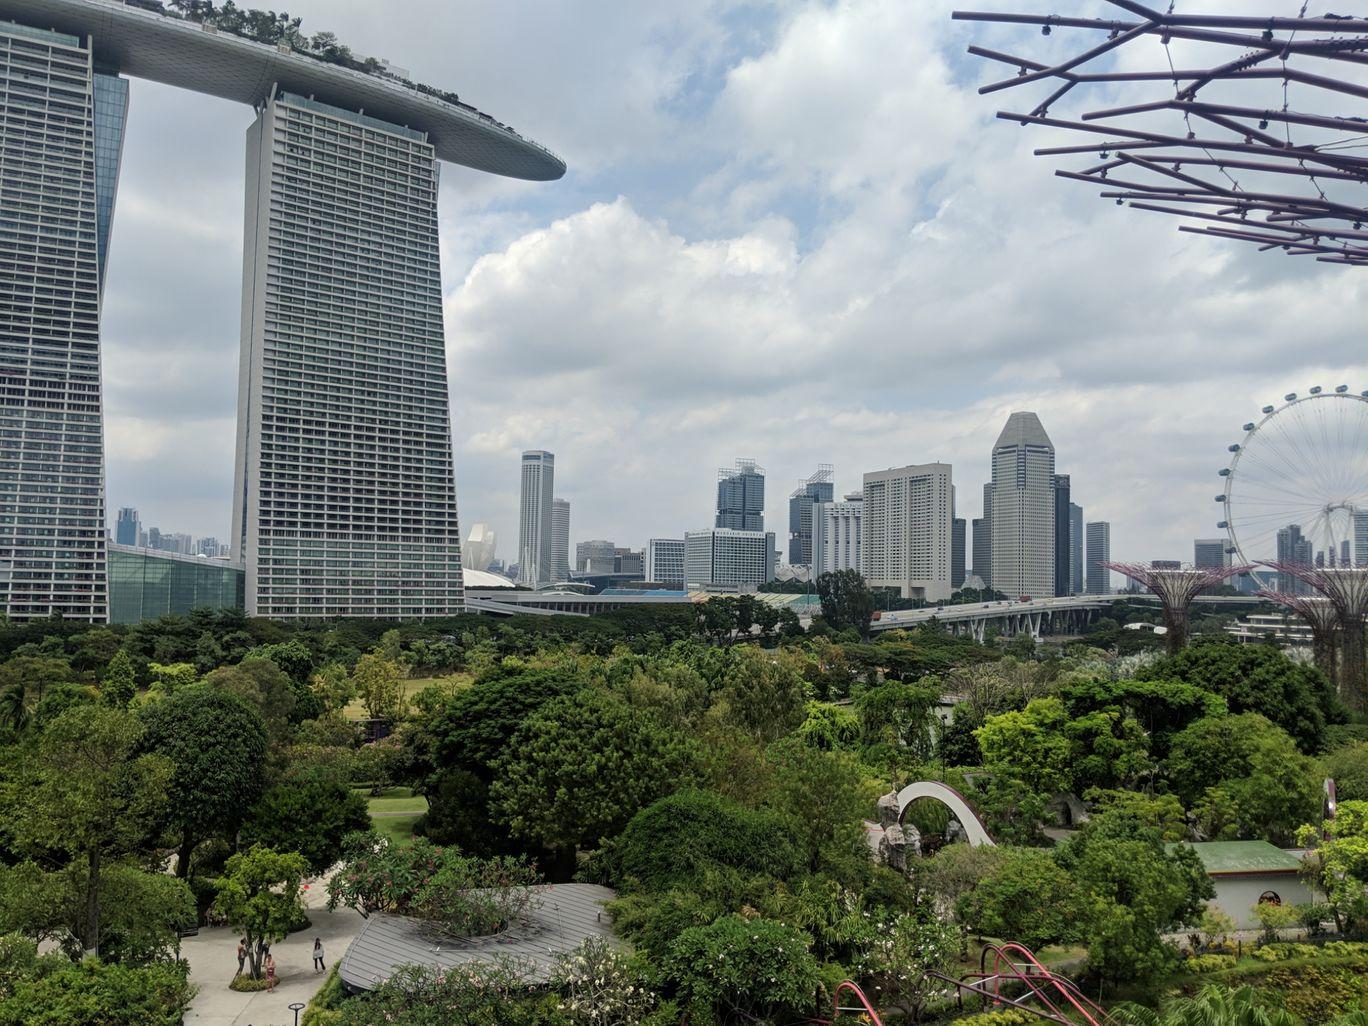 Photo of Singapore By saurav